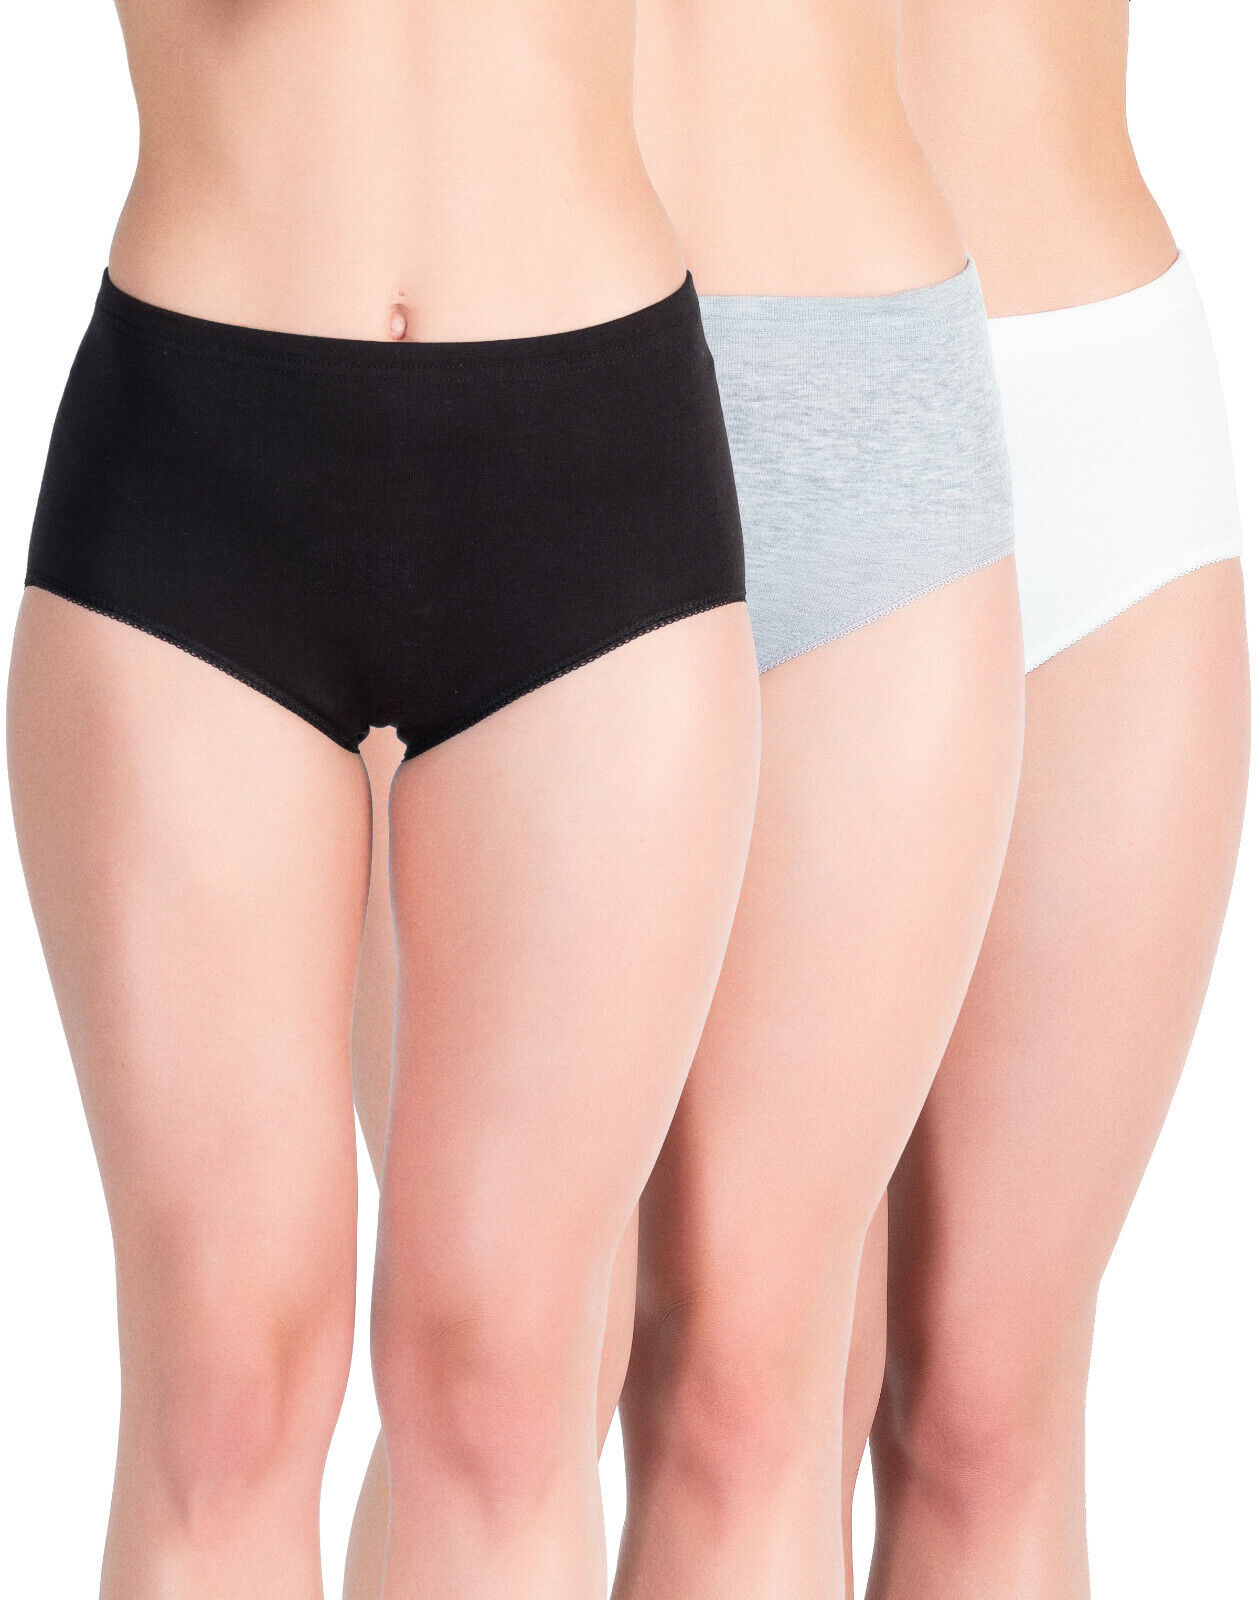 6er Set Damen Taillen-Slips Maxislip Unterhosen Baumwolle Hohe Taille